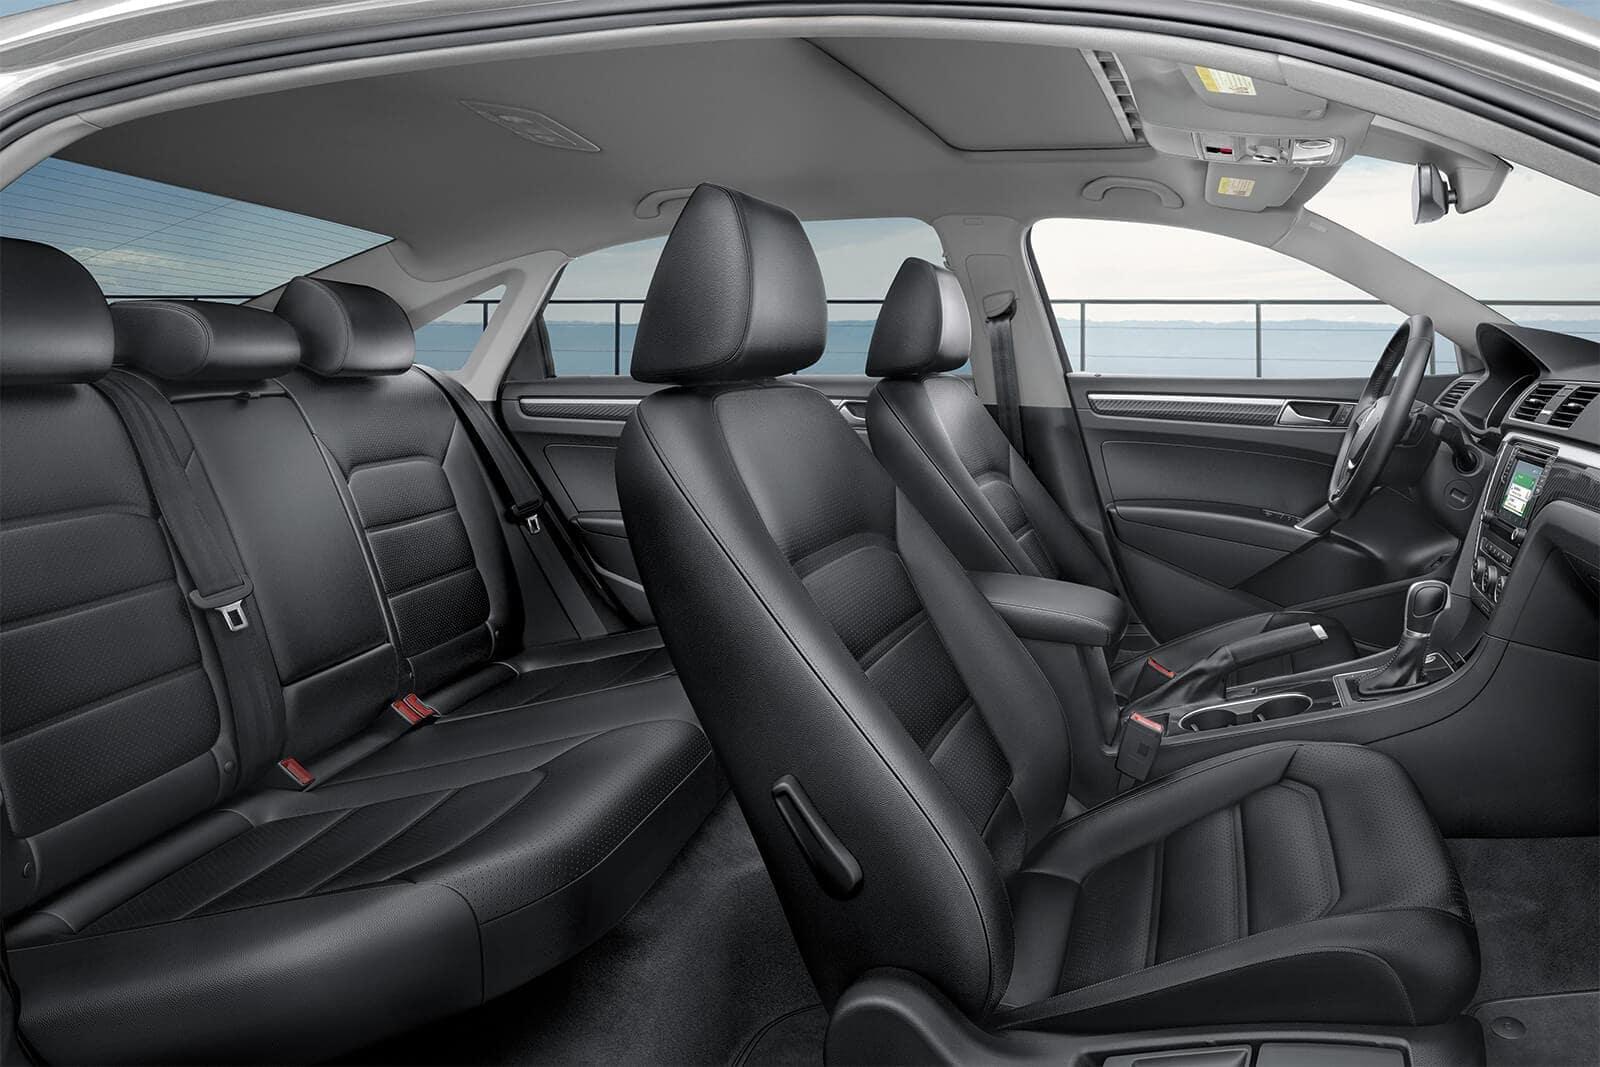 2019 Volkswagen Passat interior in titan black leatherette